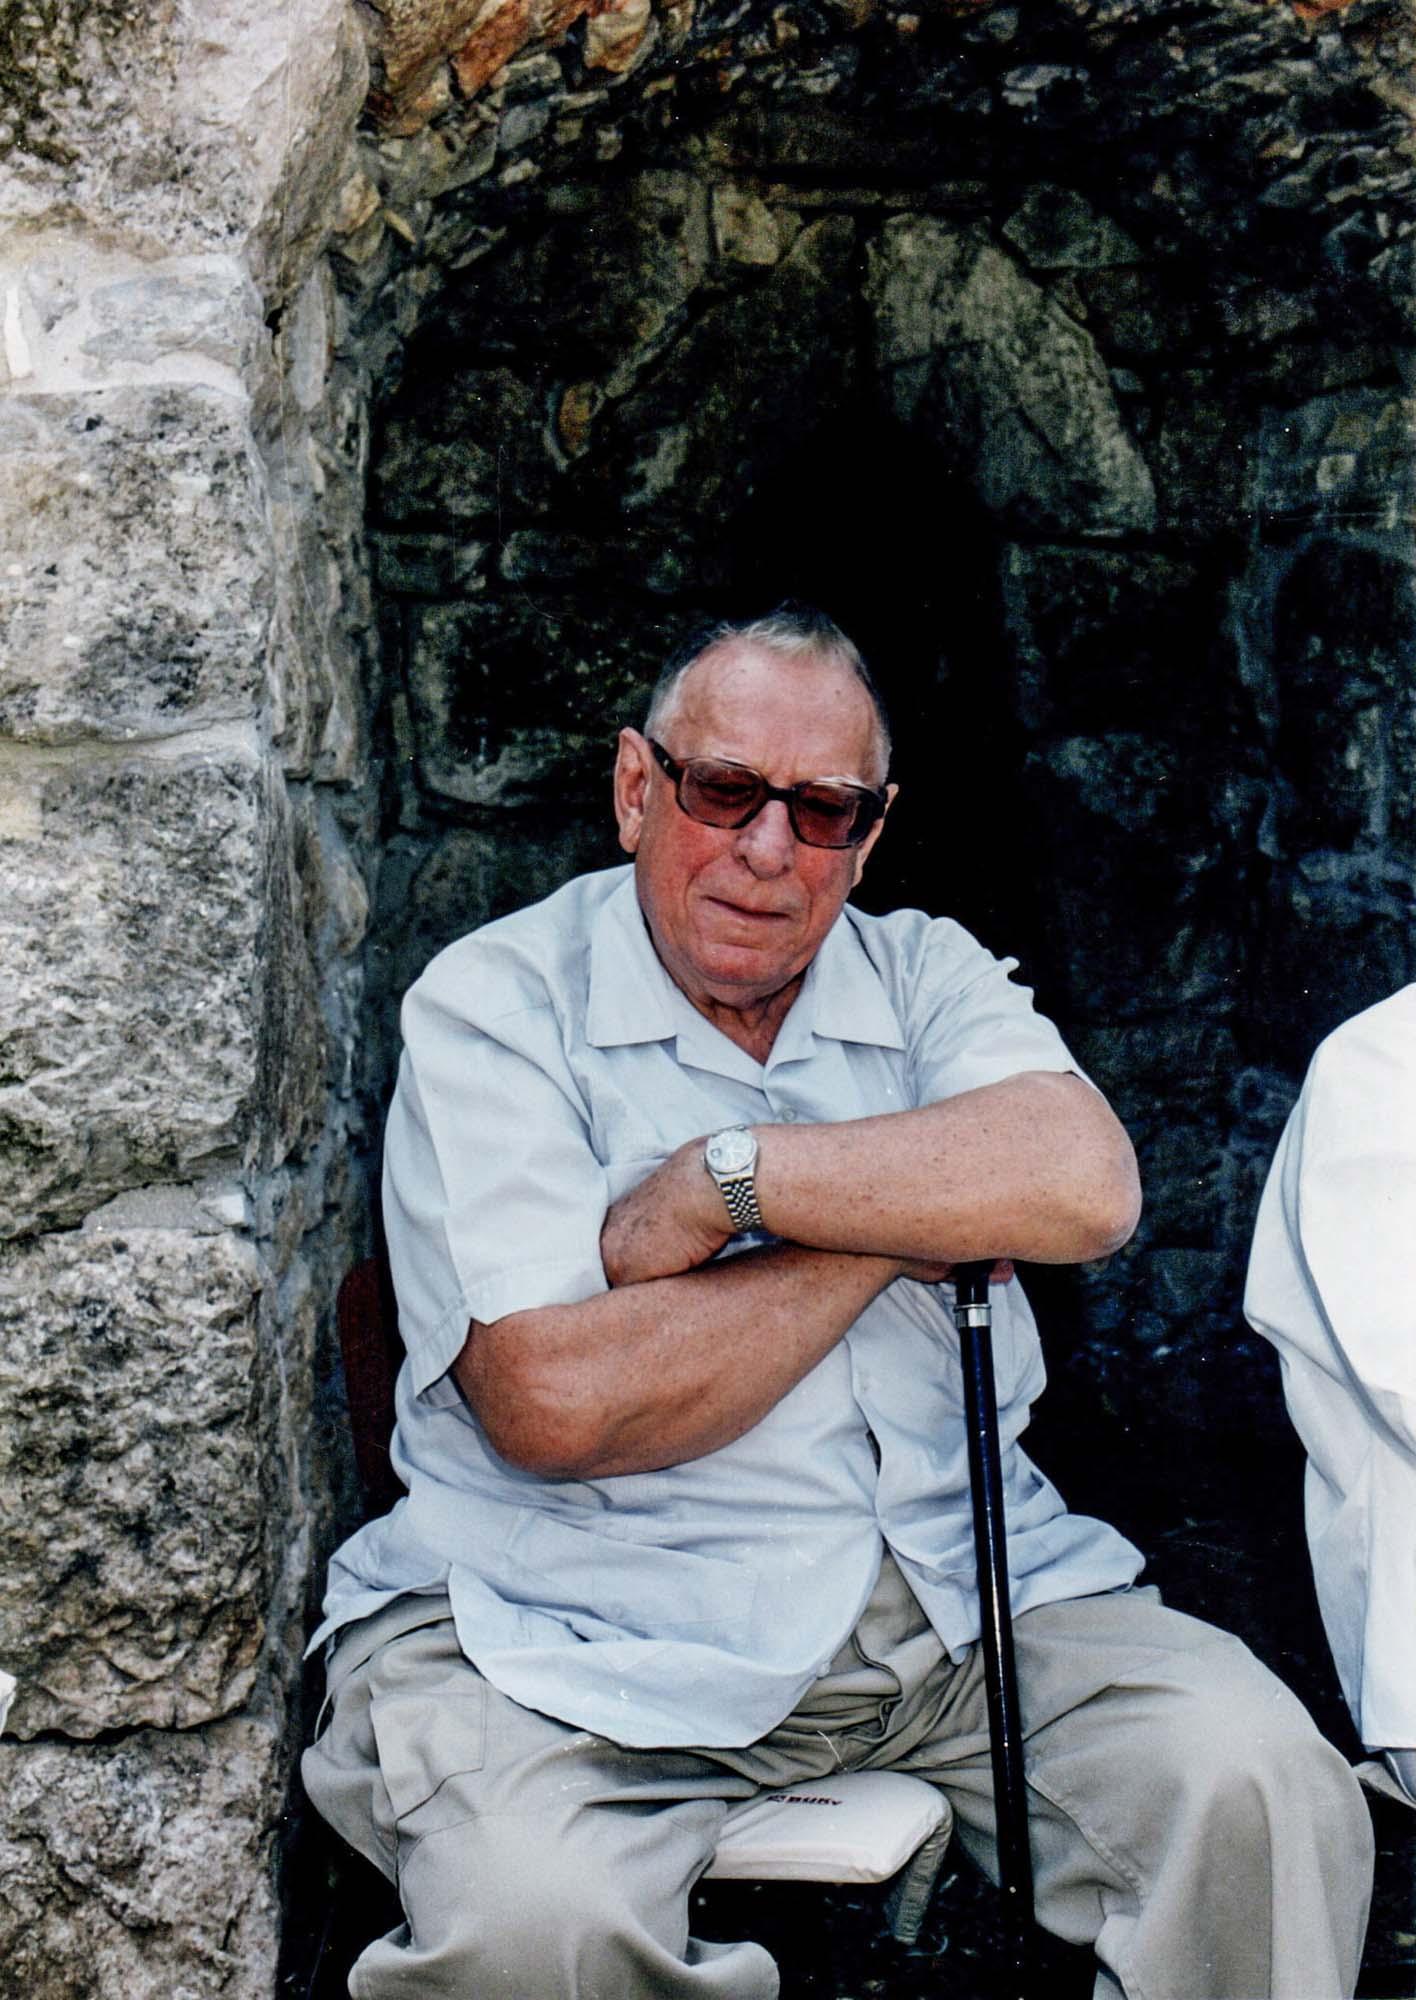 Edo Murtić, Le fronde di Dubrova, 2004